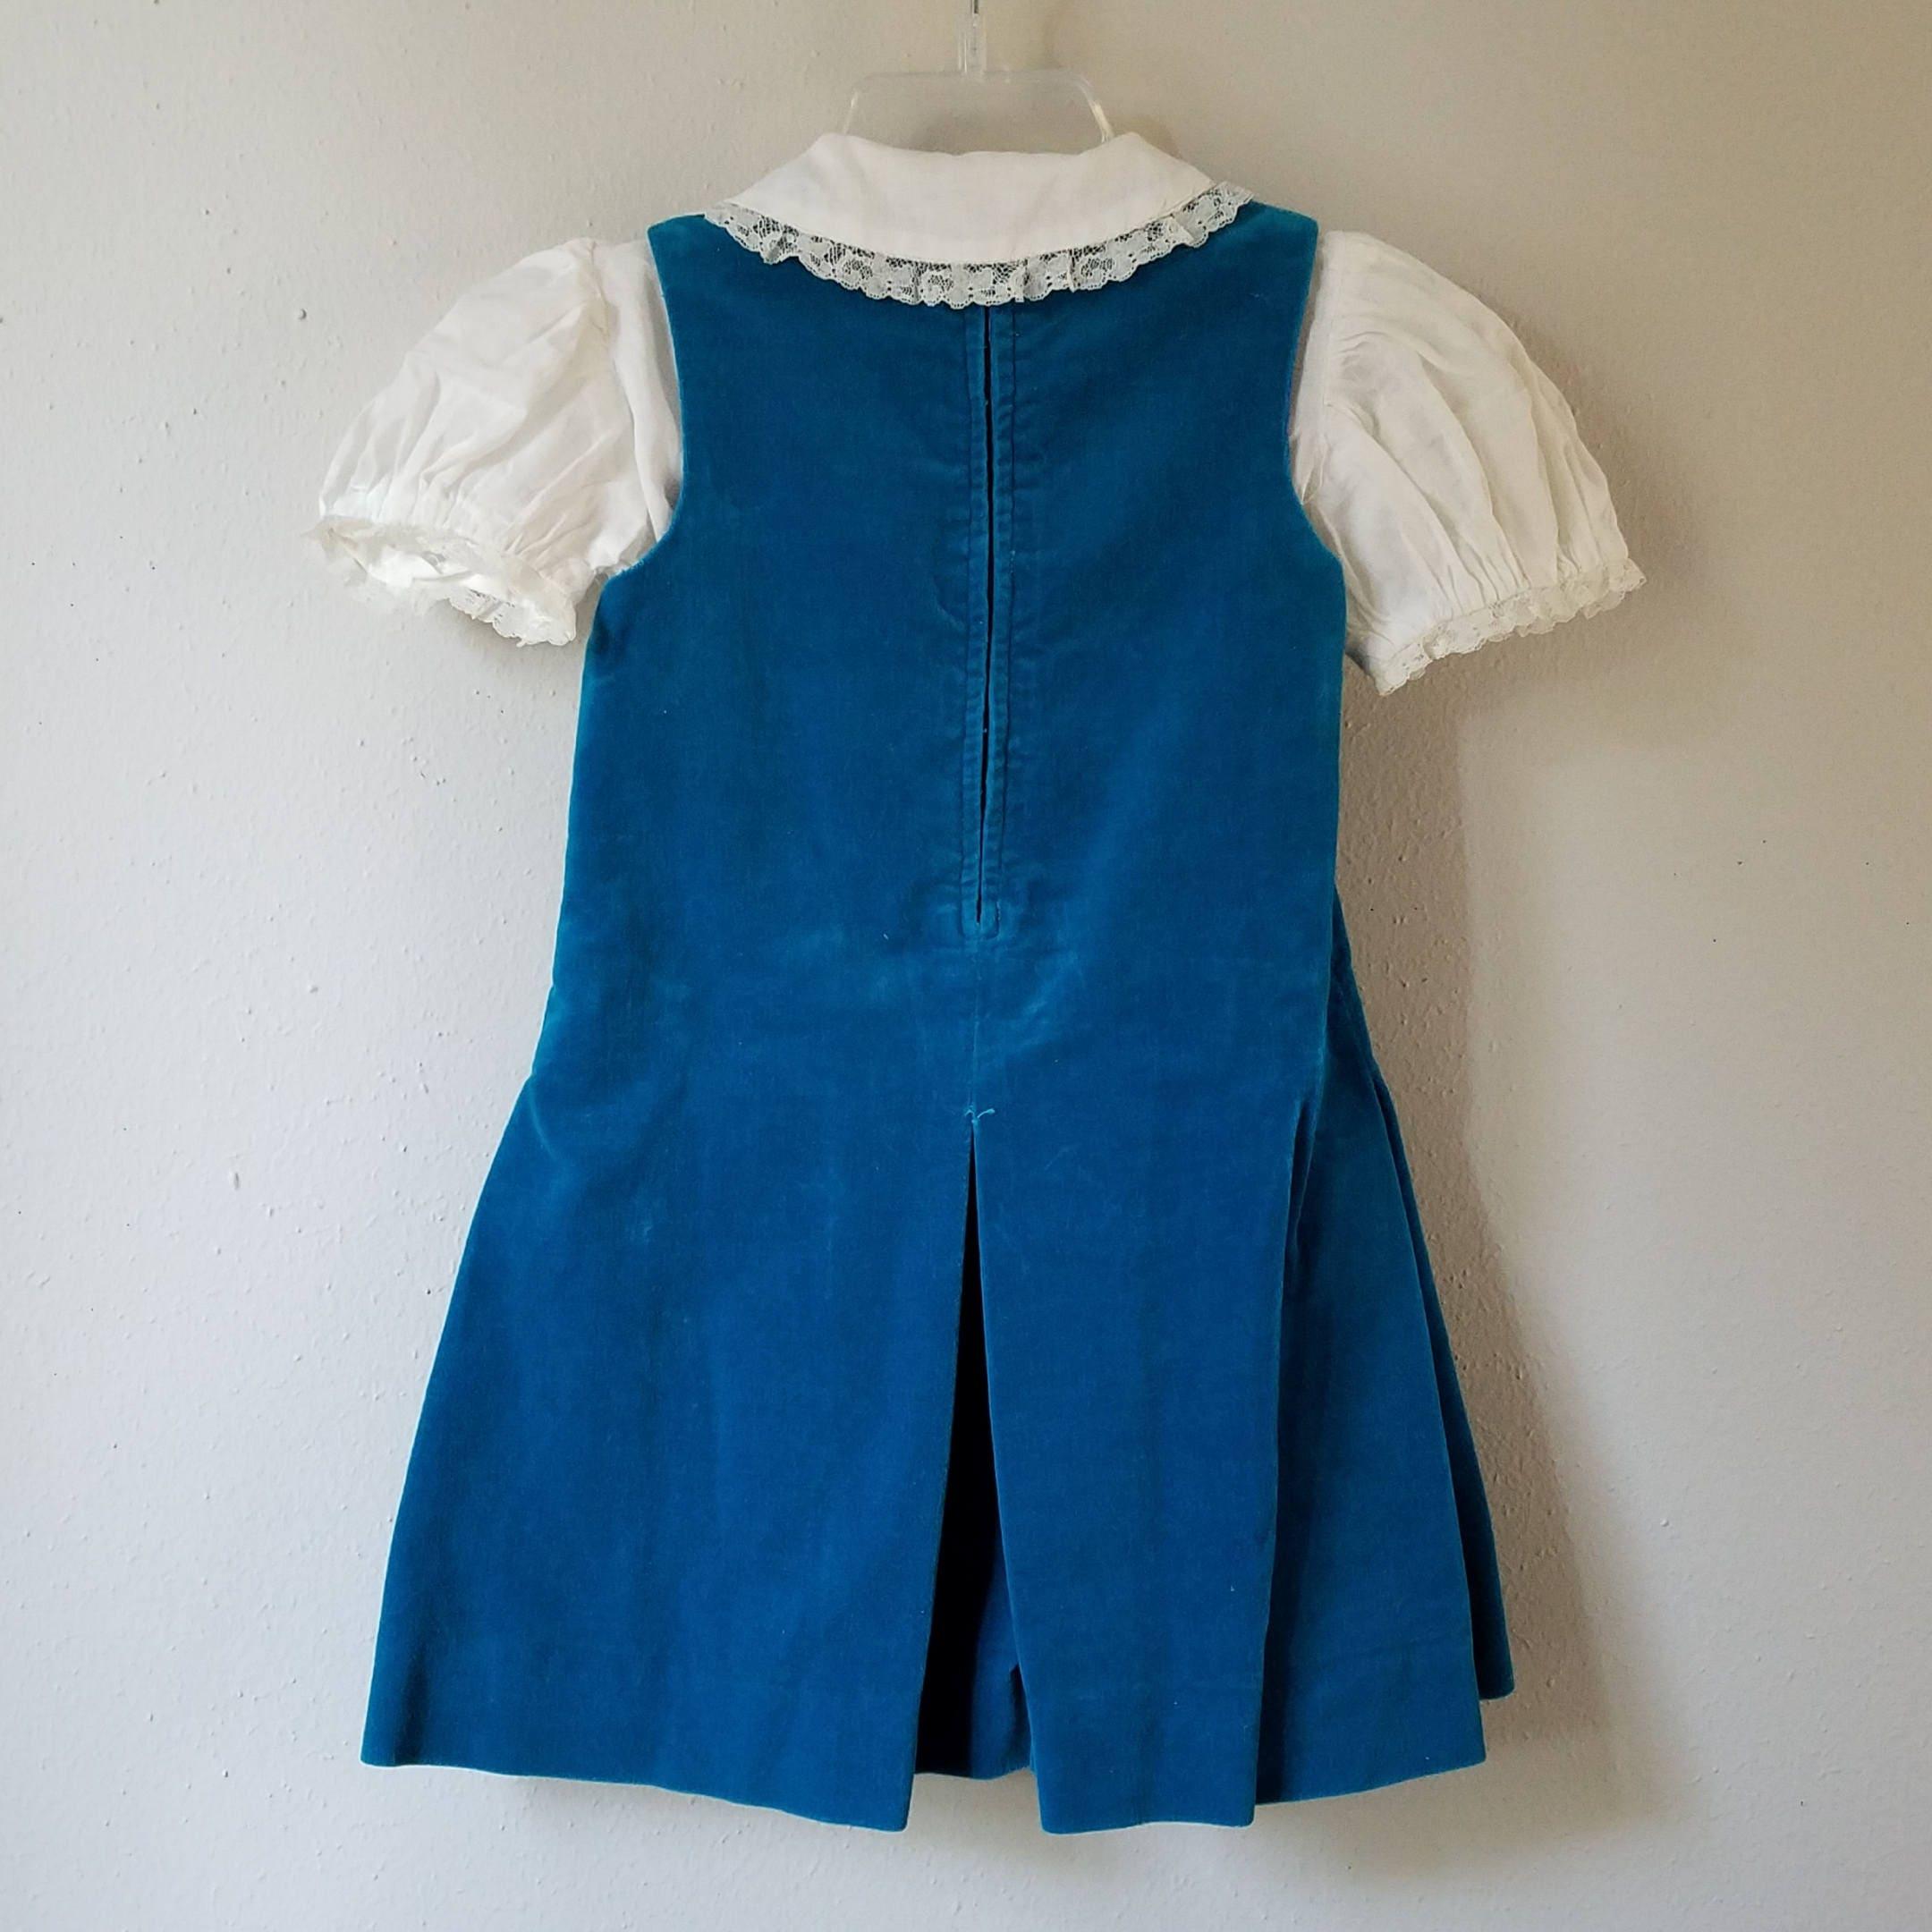 Vintage Girls Turquoise Blue Velvet Dress with White Lace Blouse